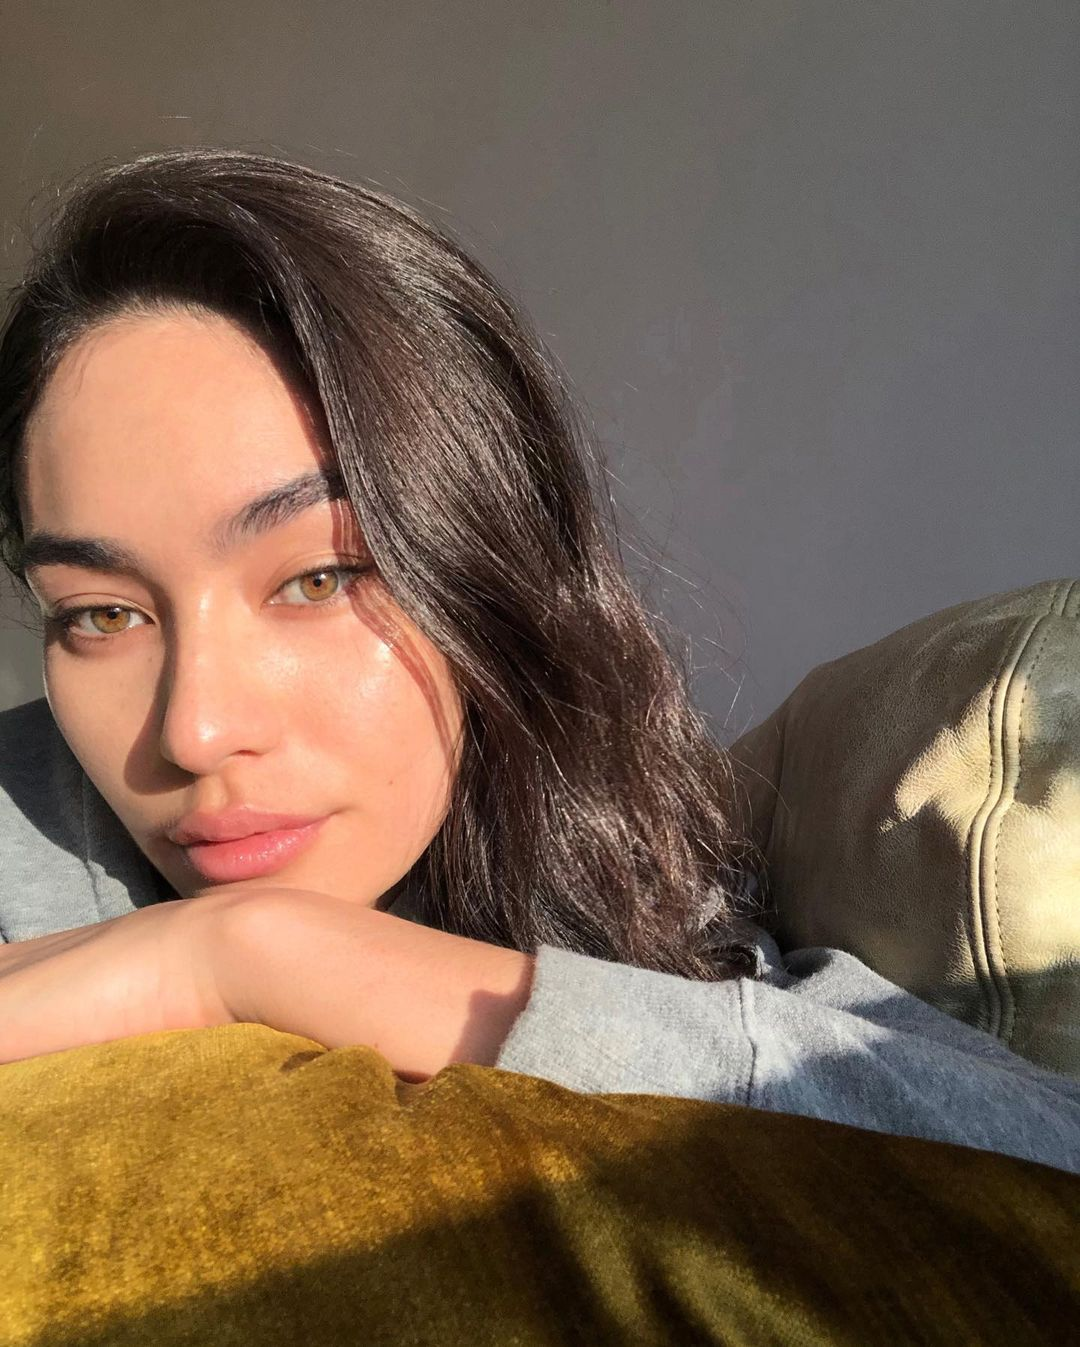 Kaitlyn-Fitzpatrick-Wallpapers-Insta-Fit-Bio-22